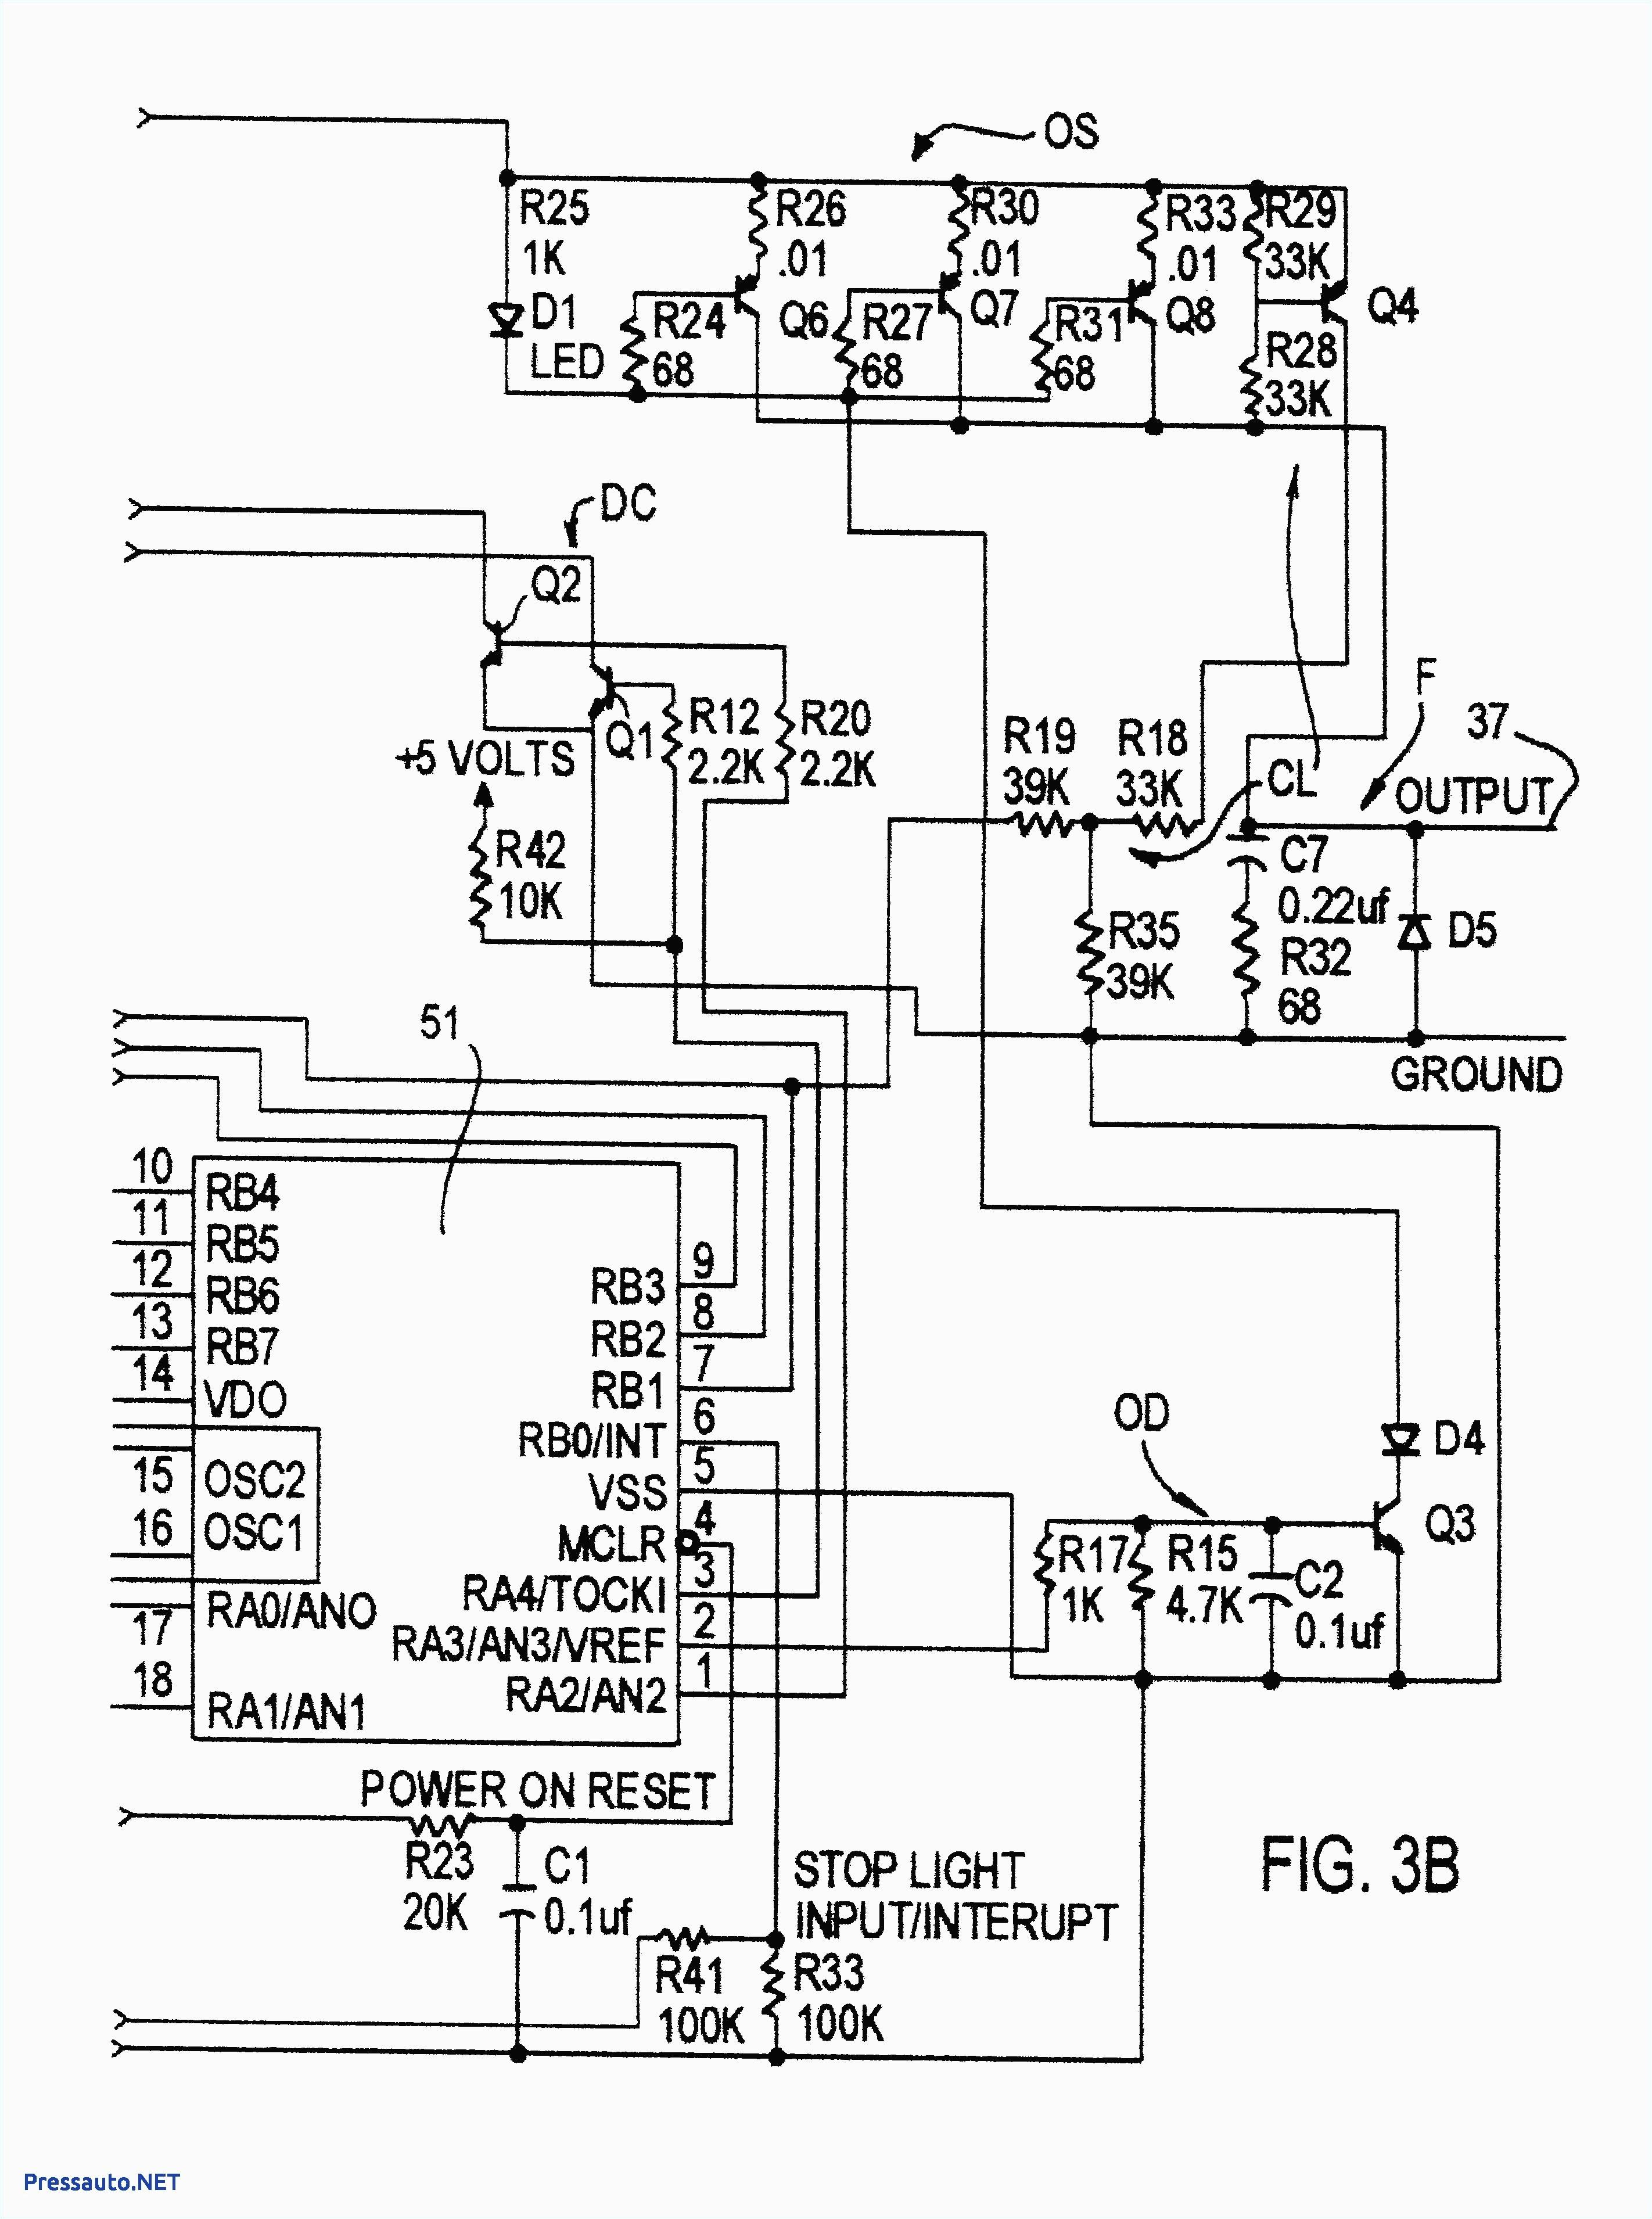 1988 jeep comanche wiring diagram new work jeep tj light wiring jeep wiring diagrams instructions of 1988 jeep comanche wiring diagram jpg